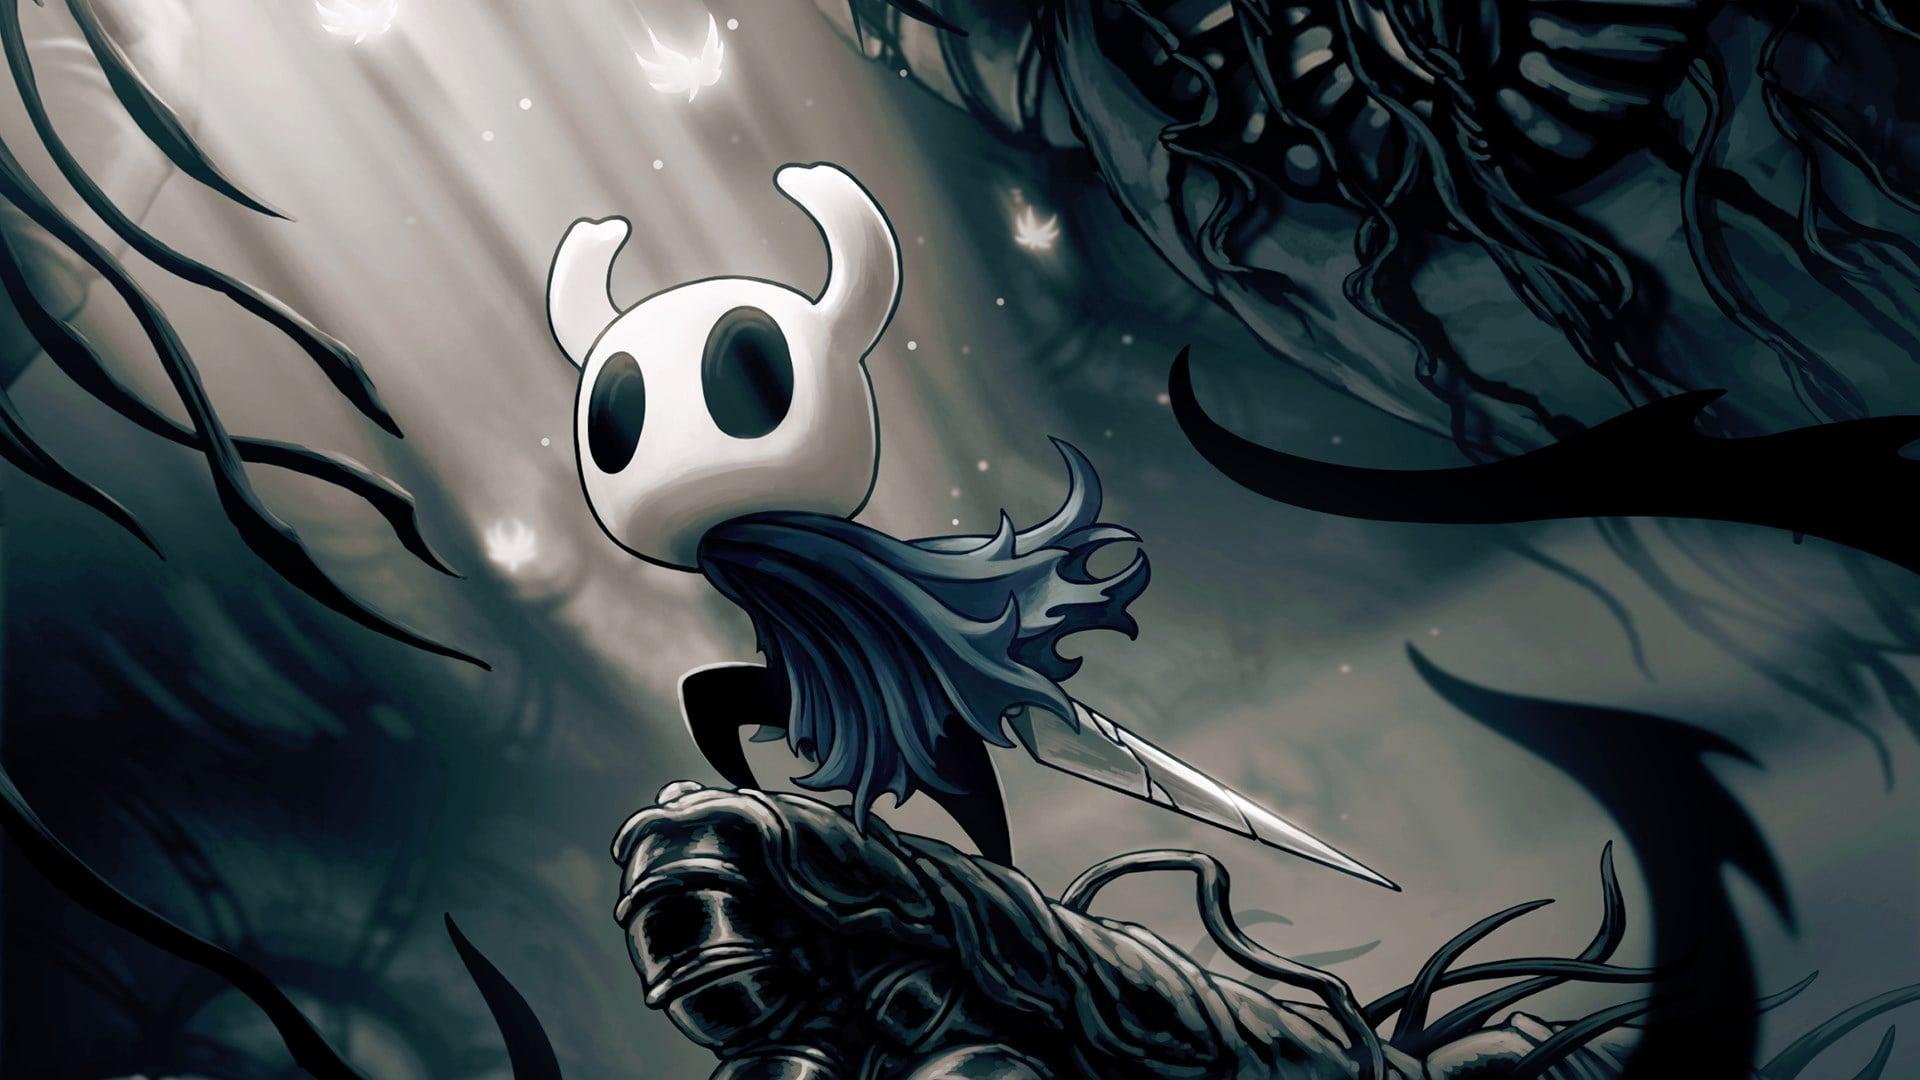 Hollow Knight Achievement List Revealed